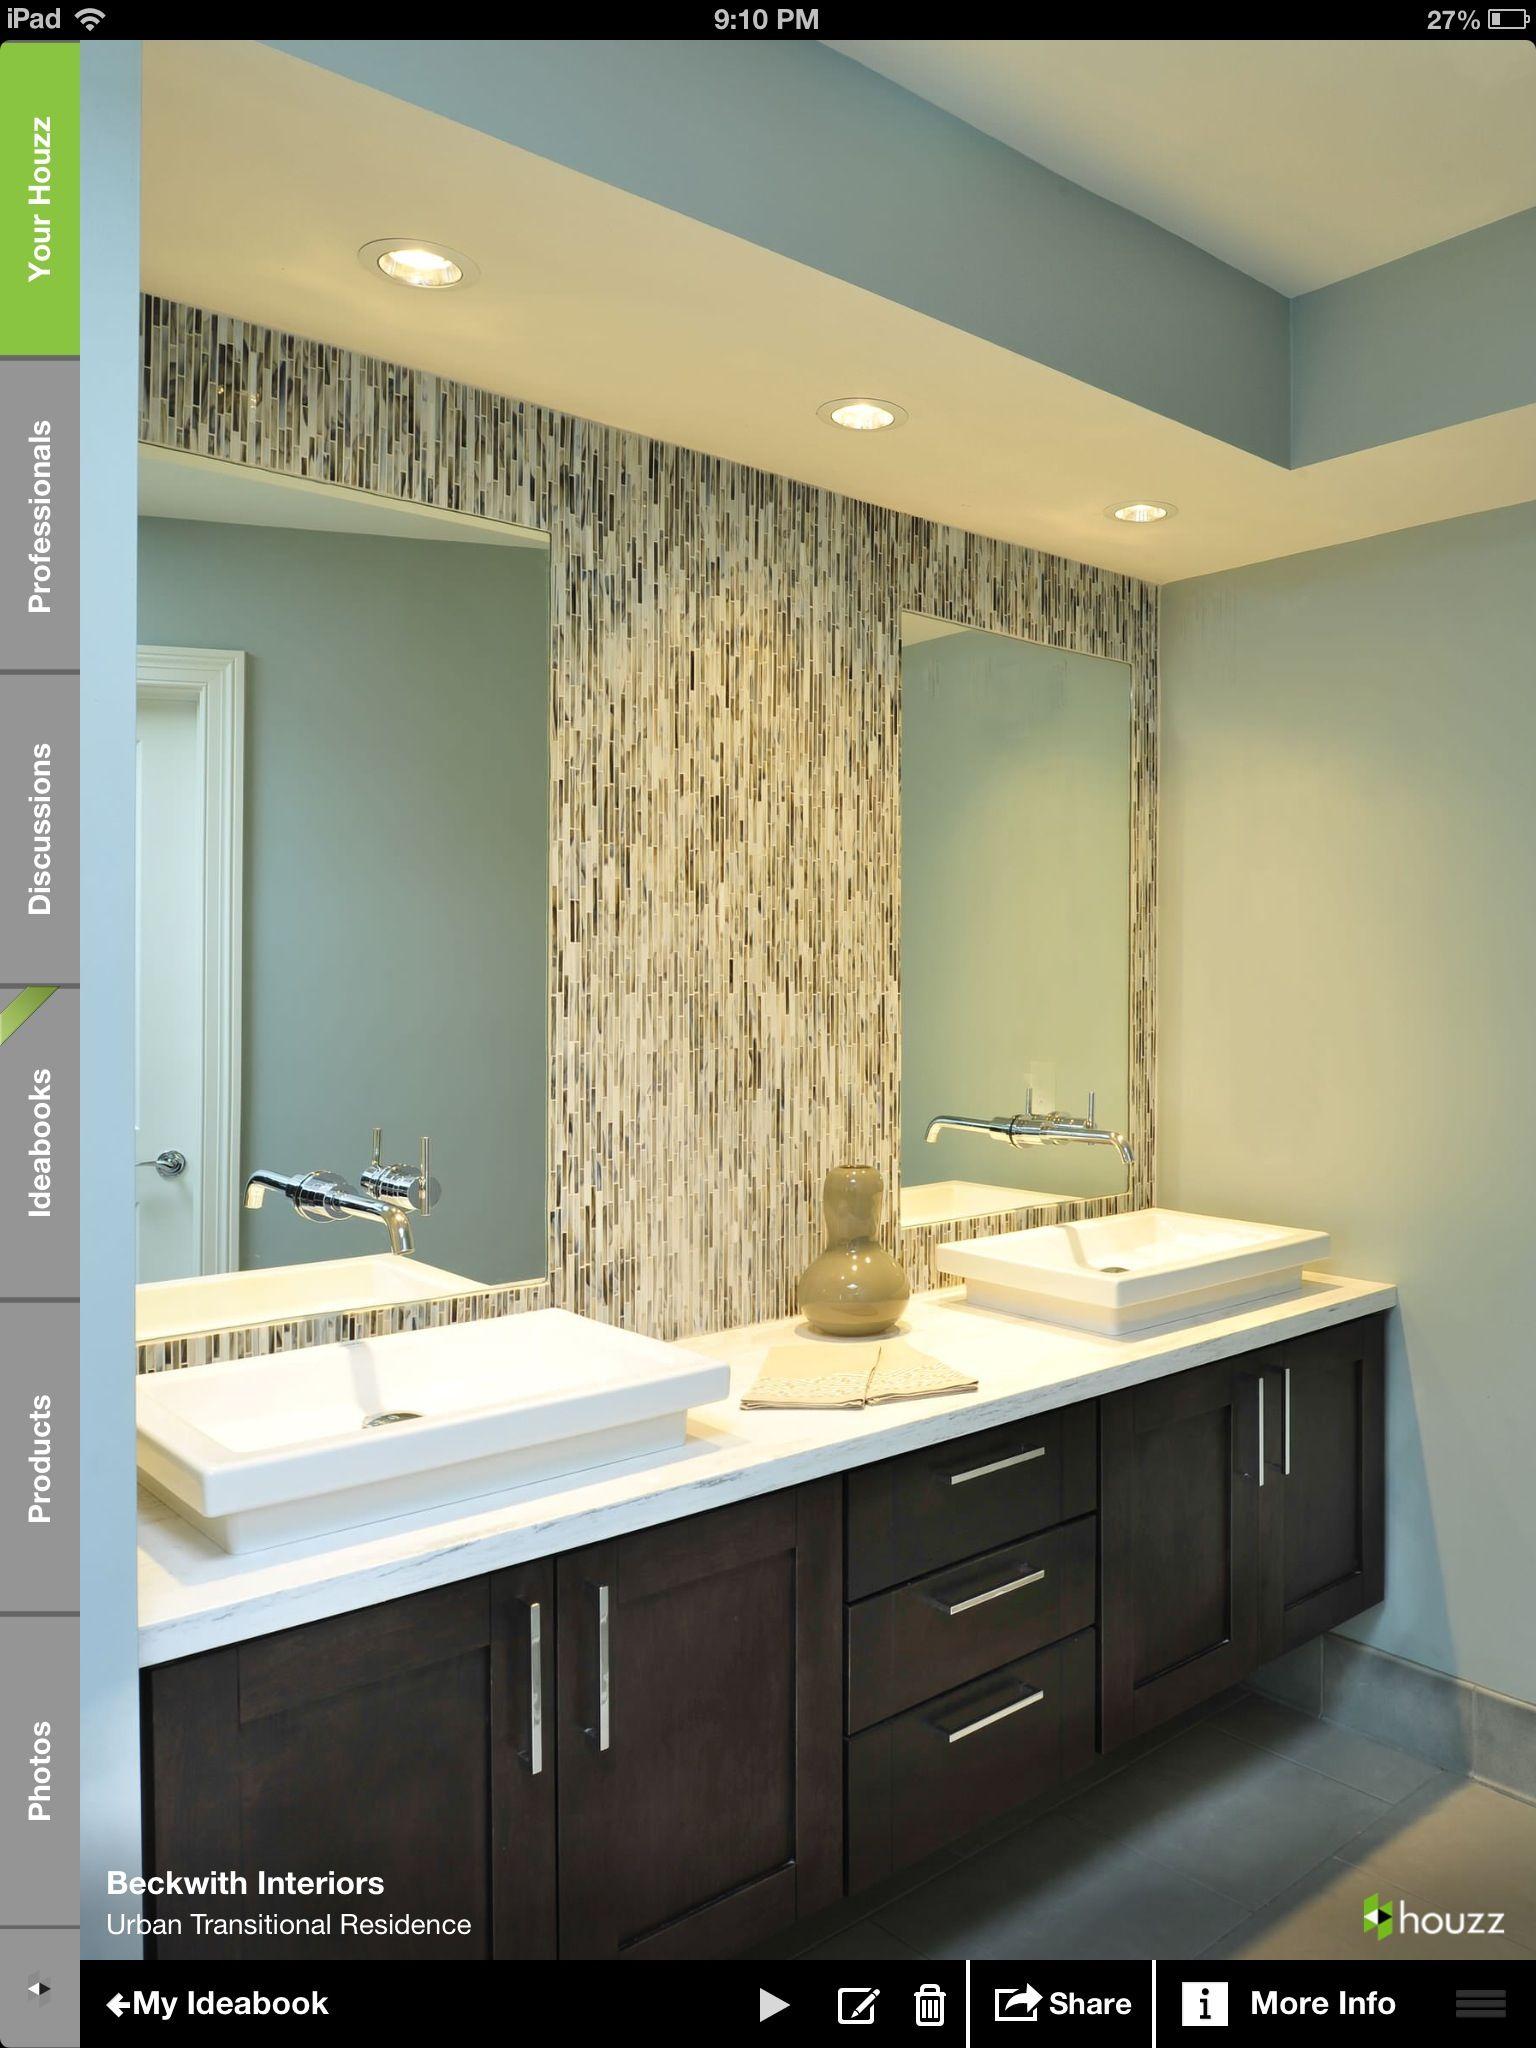 Basic Bathroom Remodel Set master bath idea set up with make up vanity in middle | house